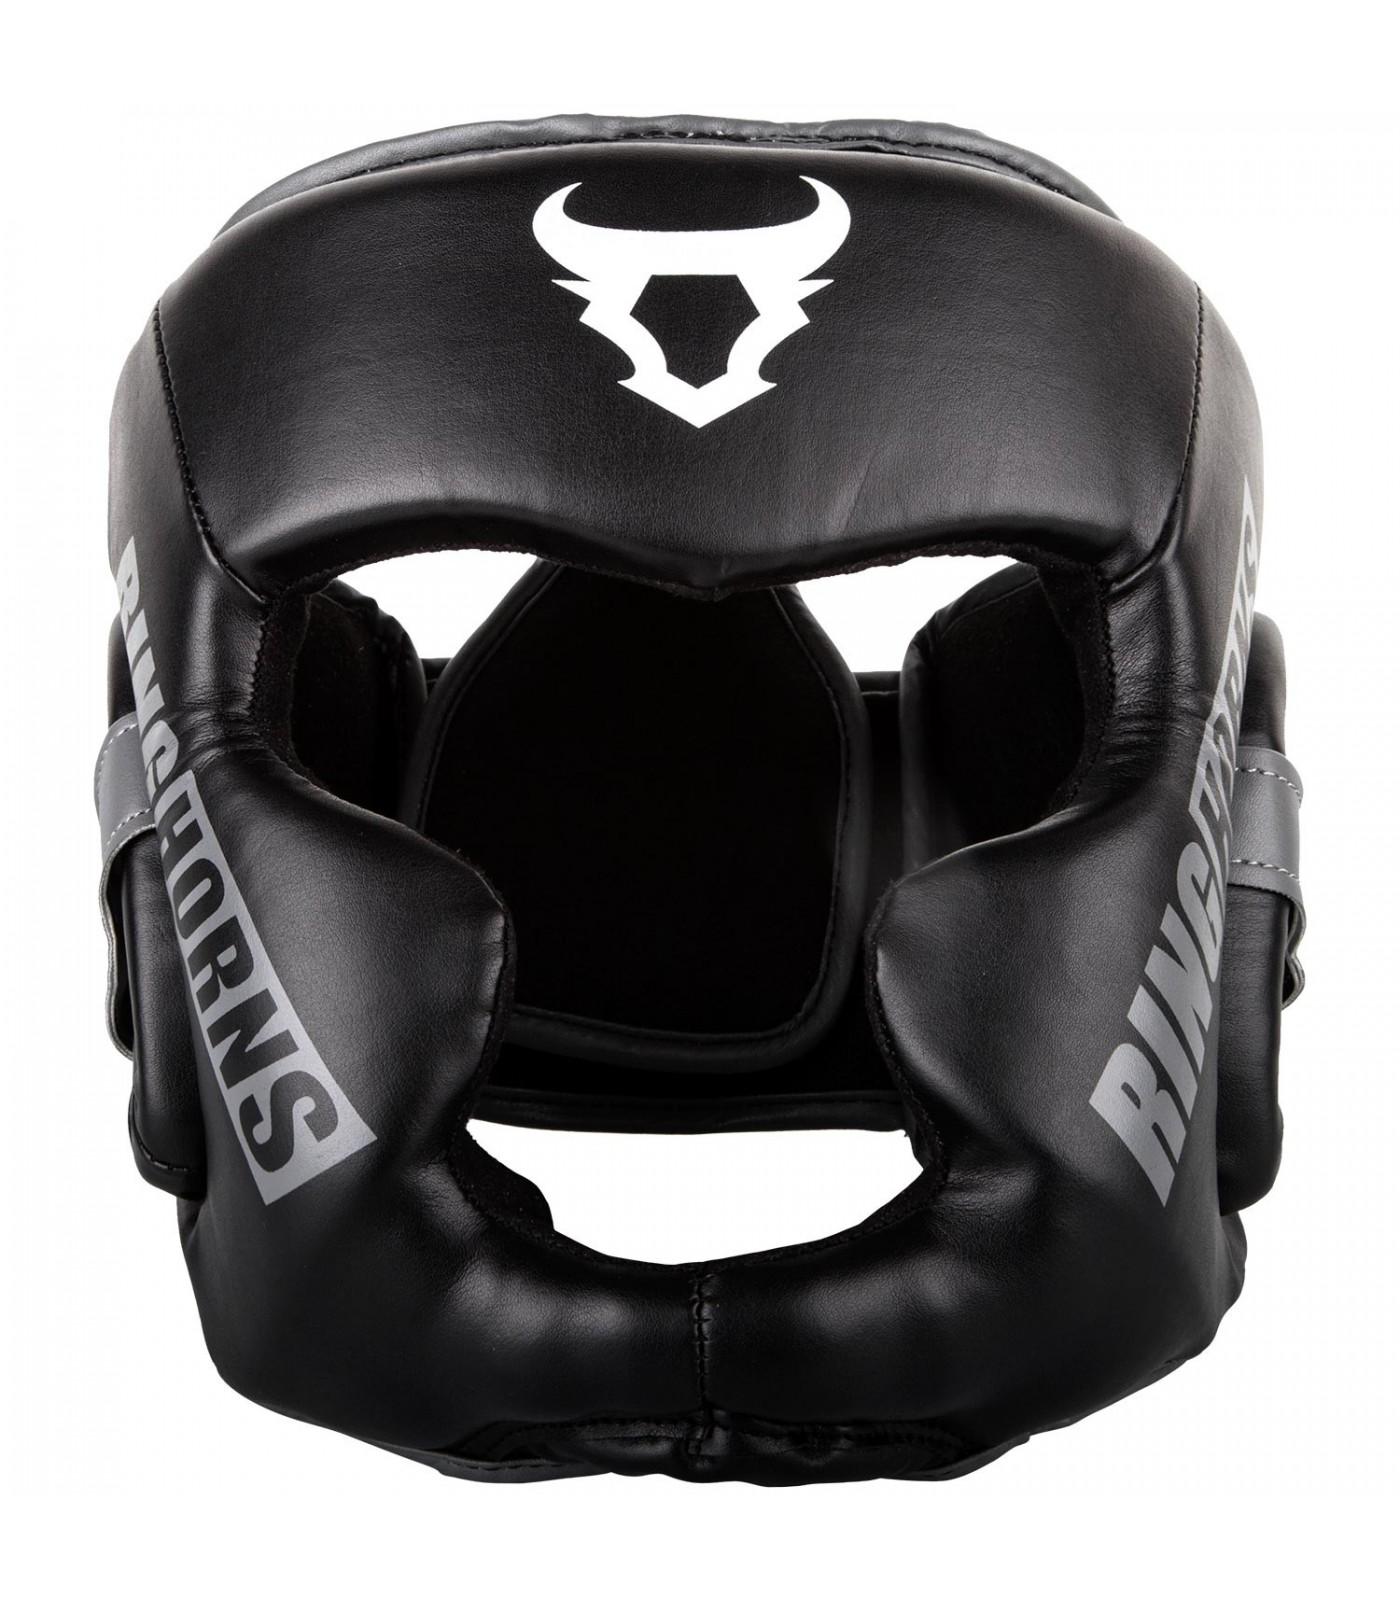 Протектор за глава / Каска - Ringhorns Charger Headgear - Black 